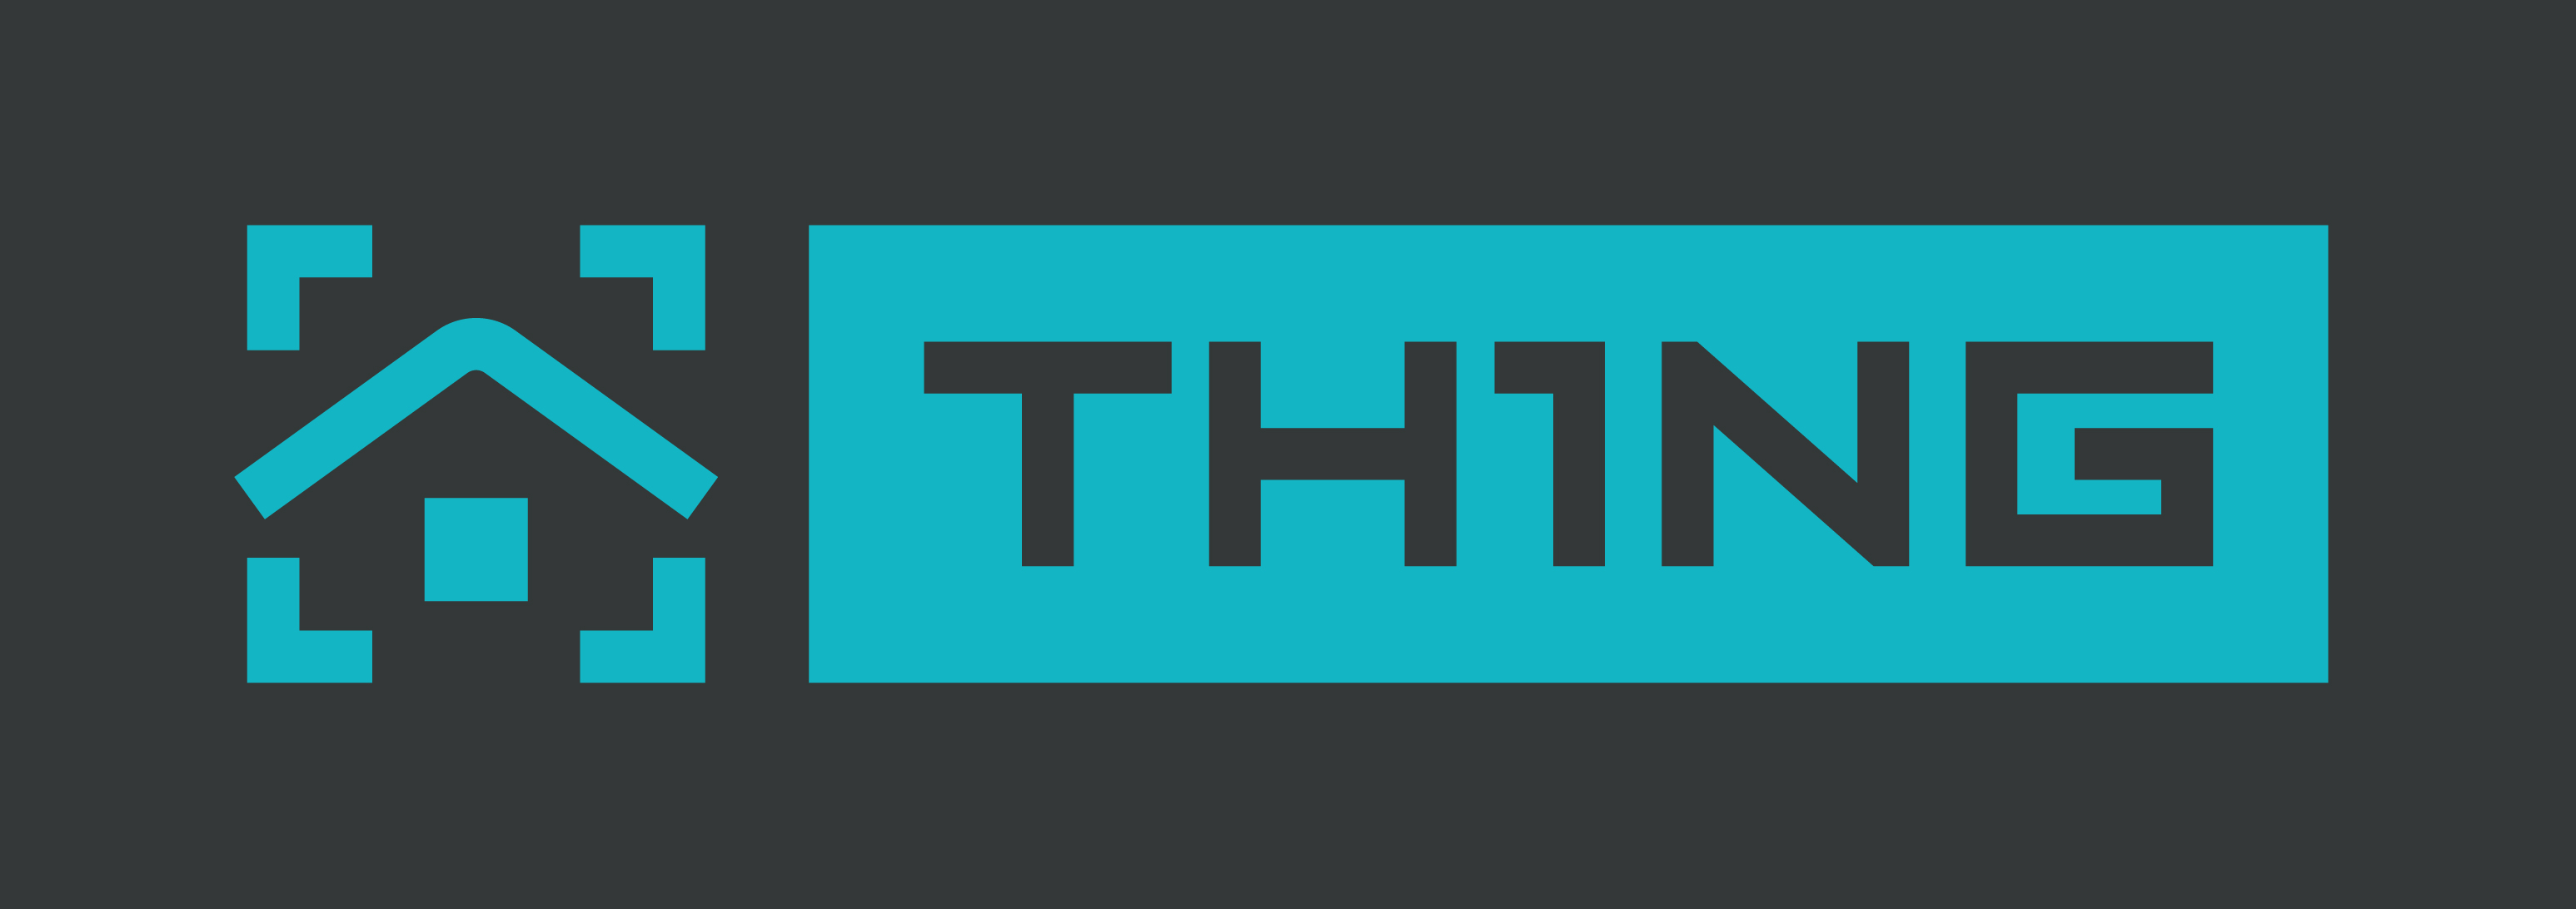 TH1NG_Logo_Turquoise_on_Dark_Grey